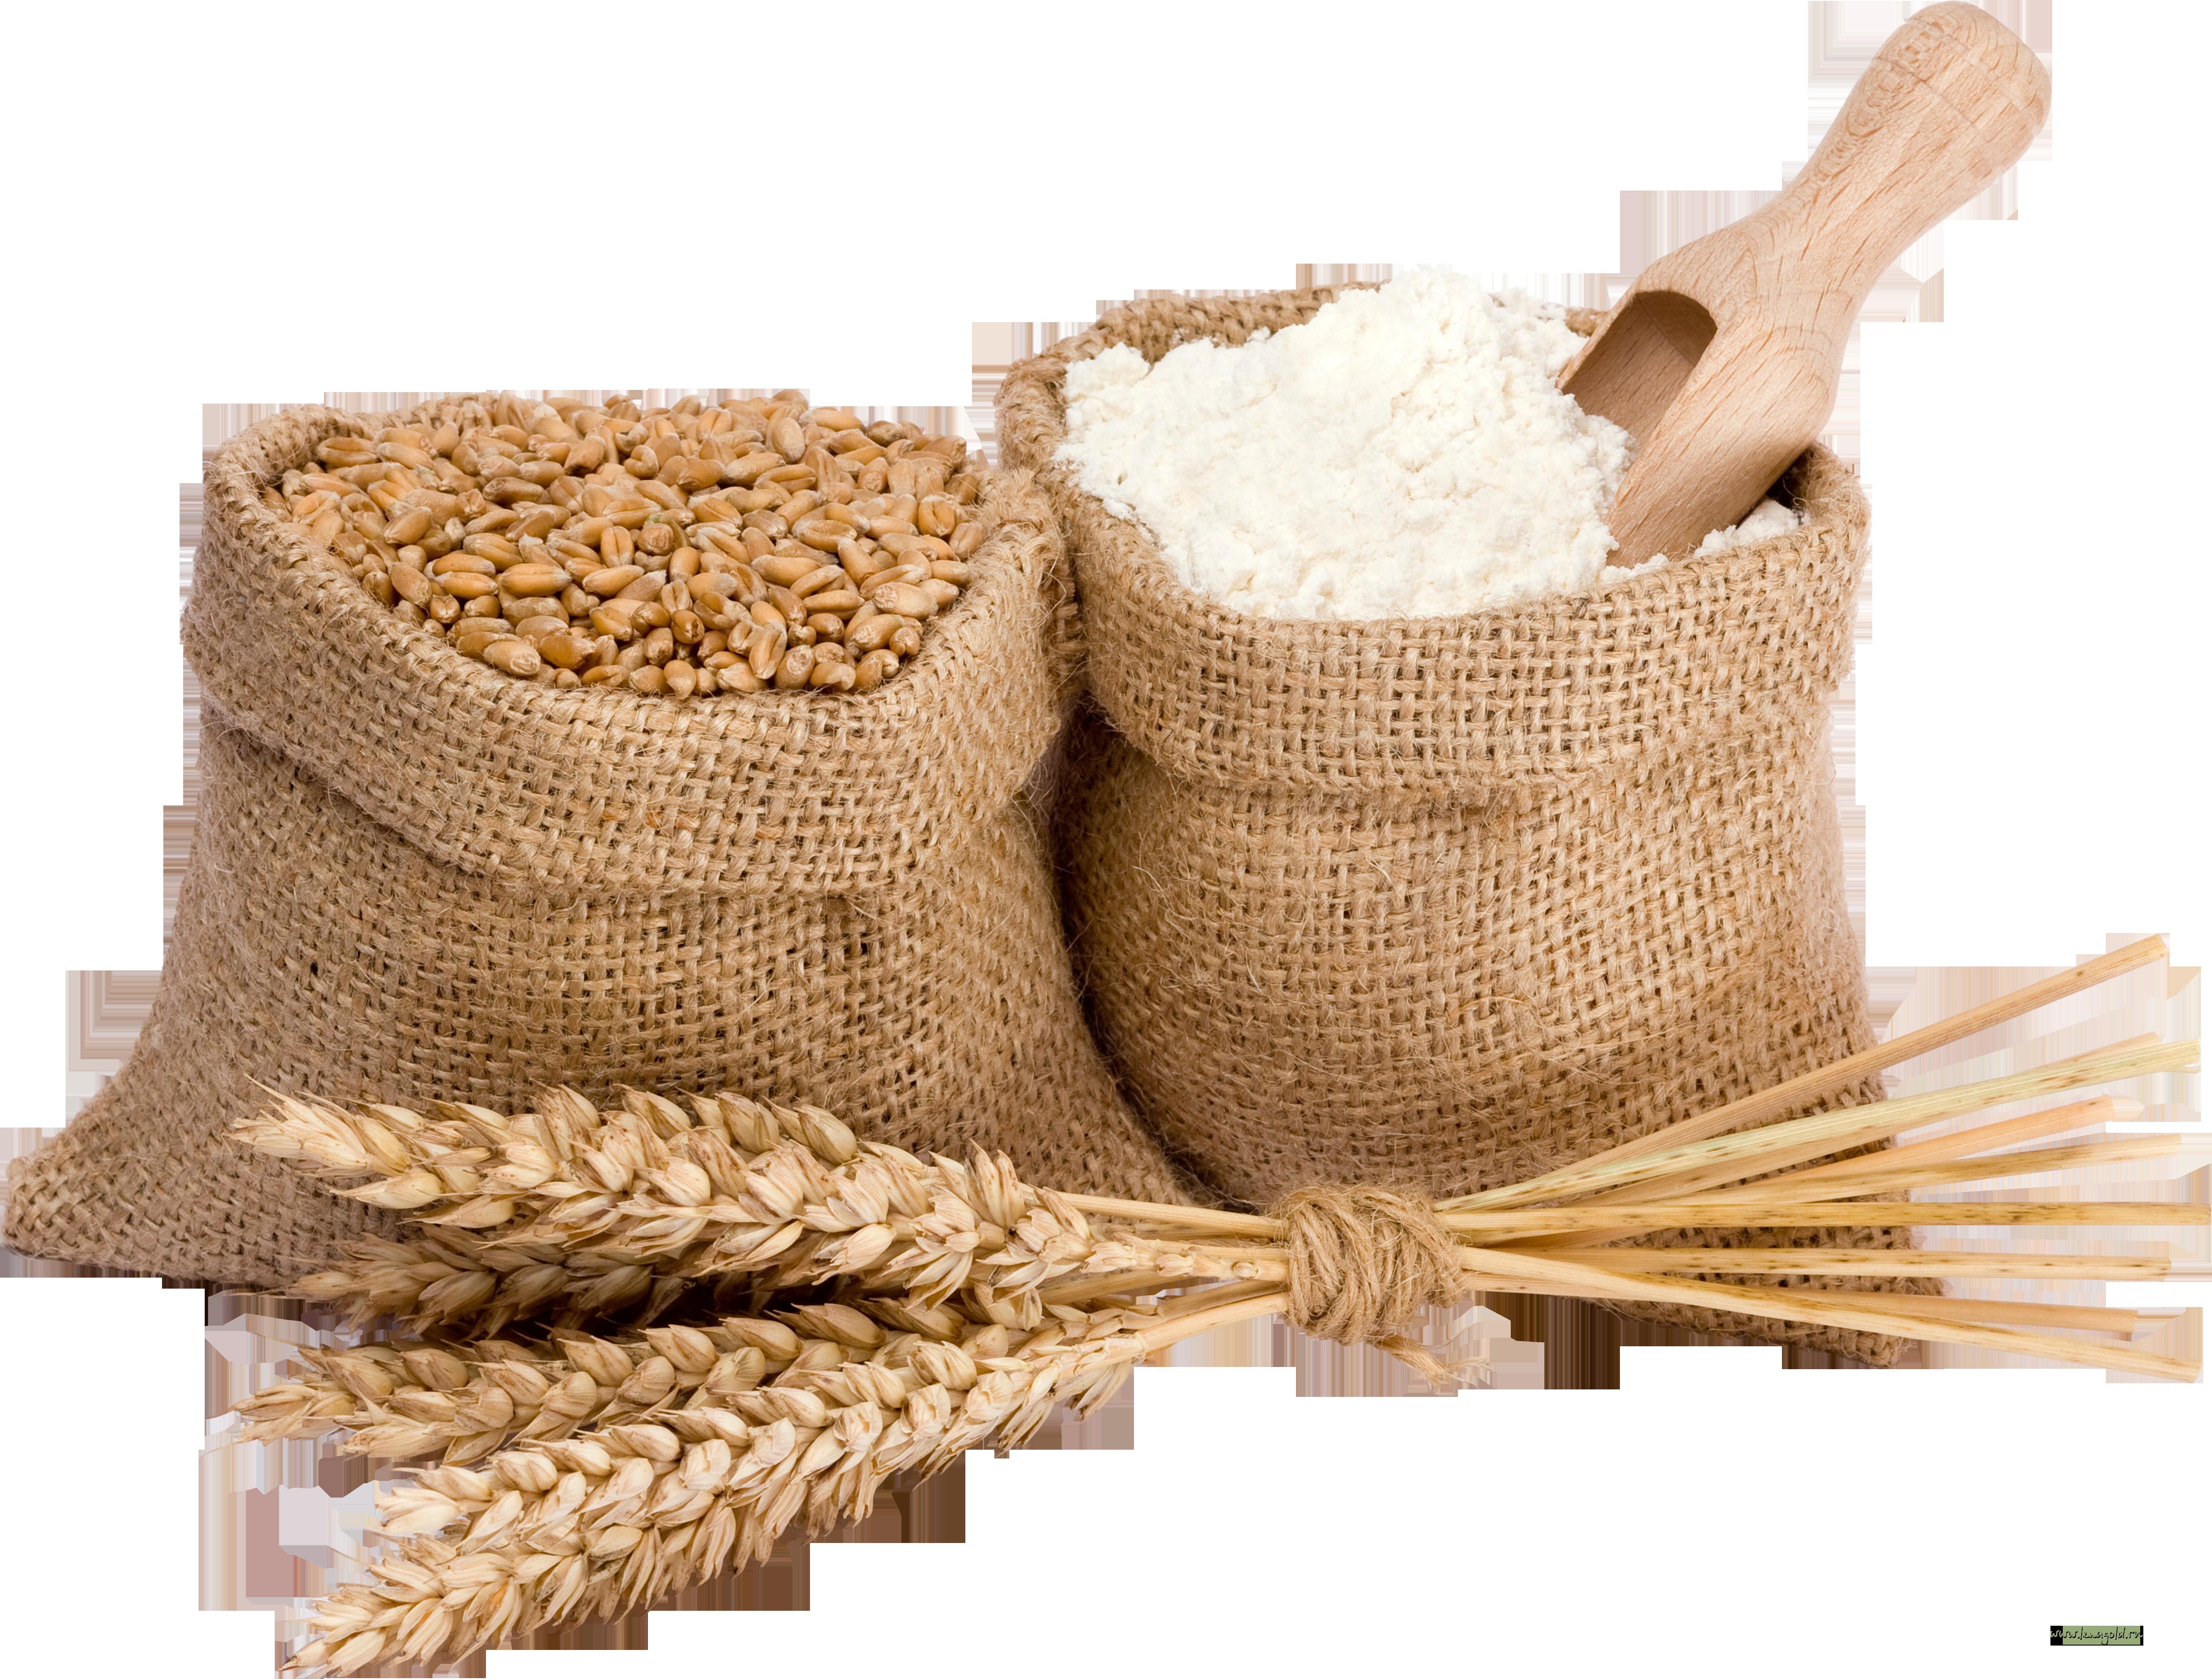 Png image purepng free. Wheat clipart grain bag